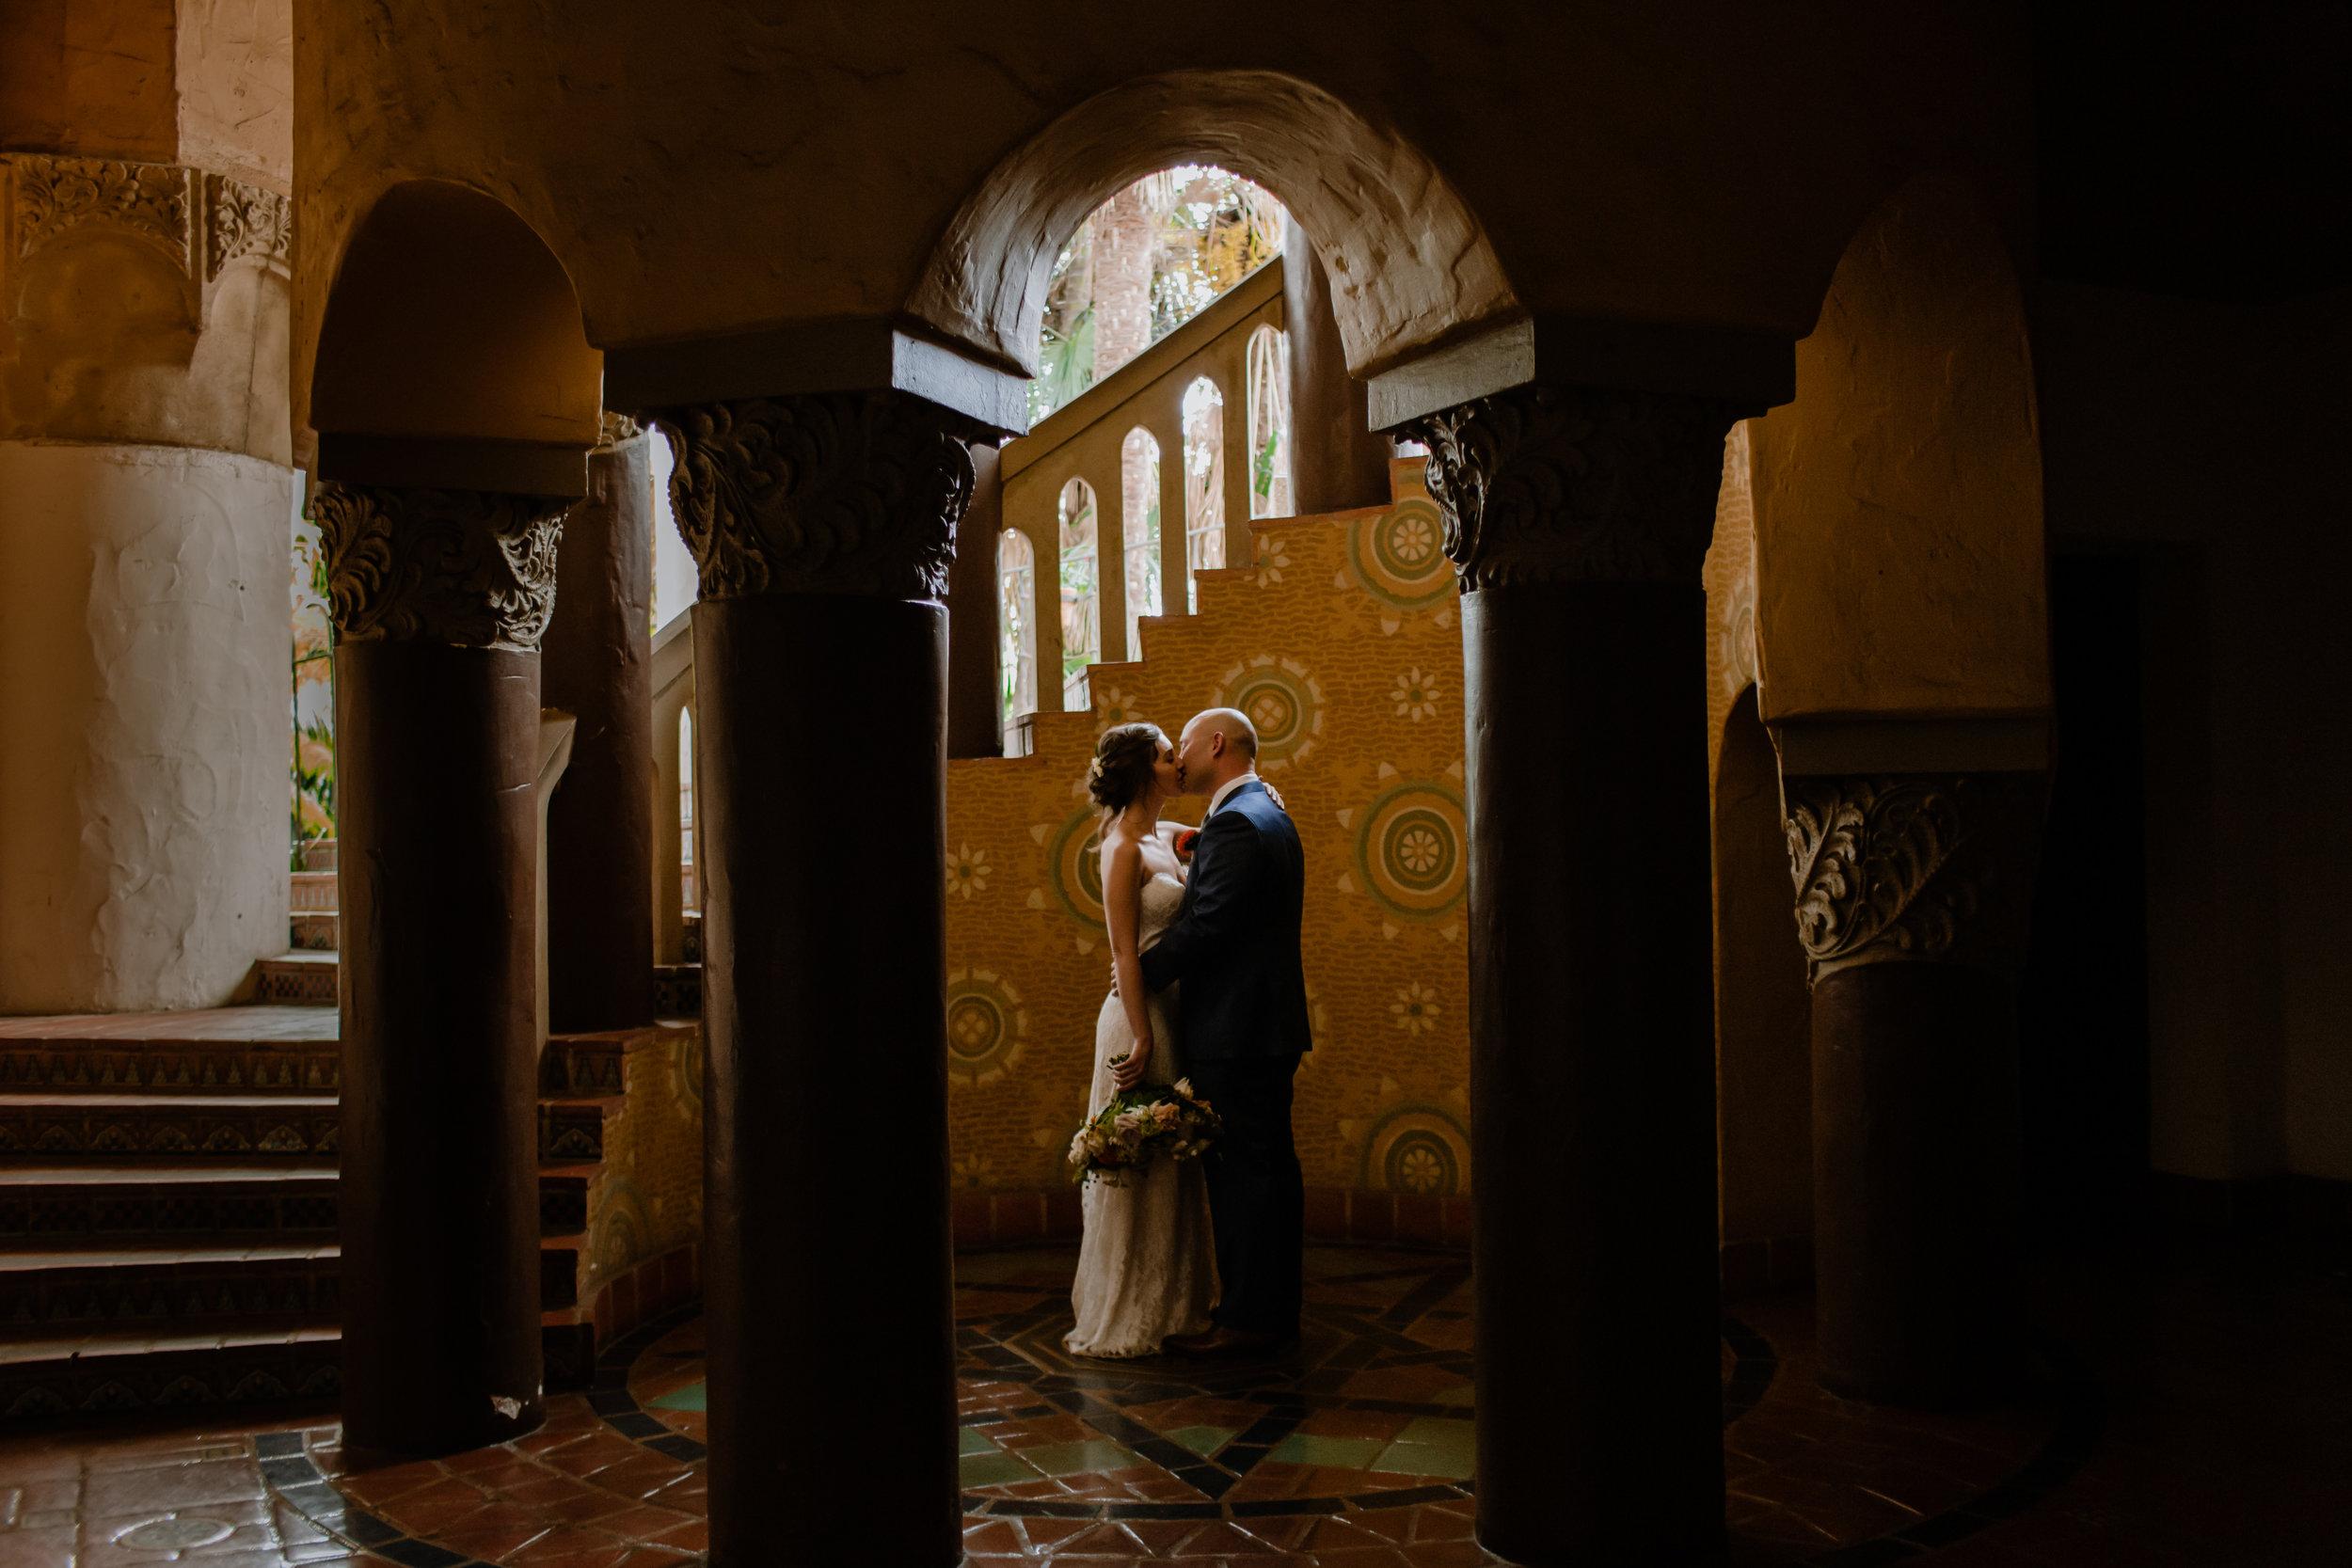 Robin and John Santa Barbara Wedding - Eve Rox Photography-102.jpg